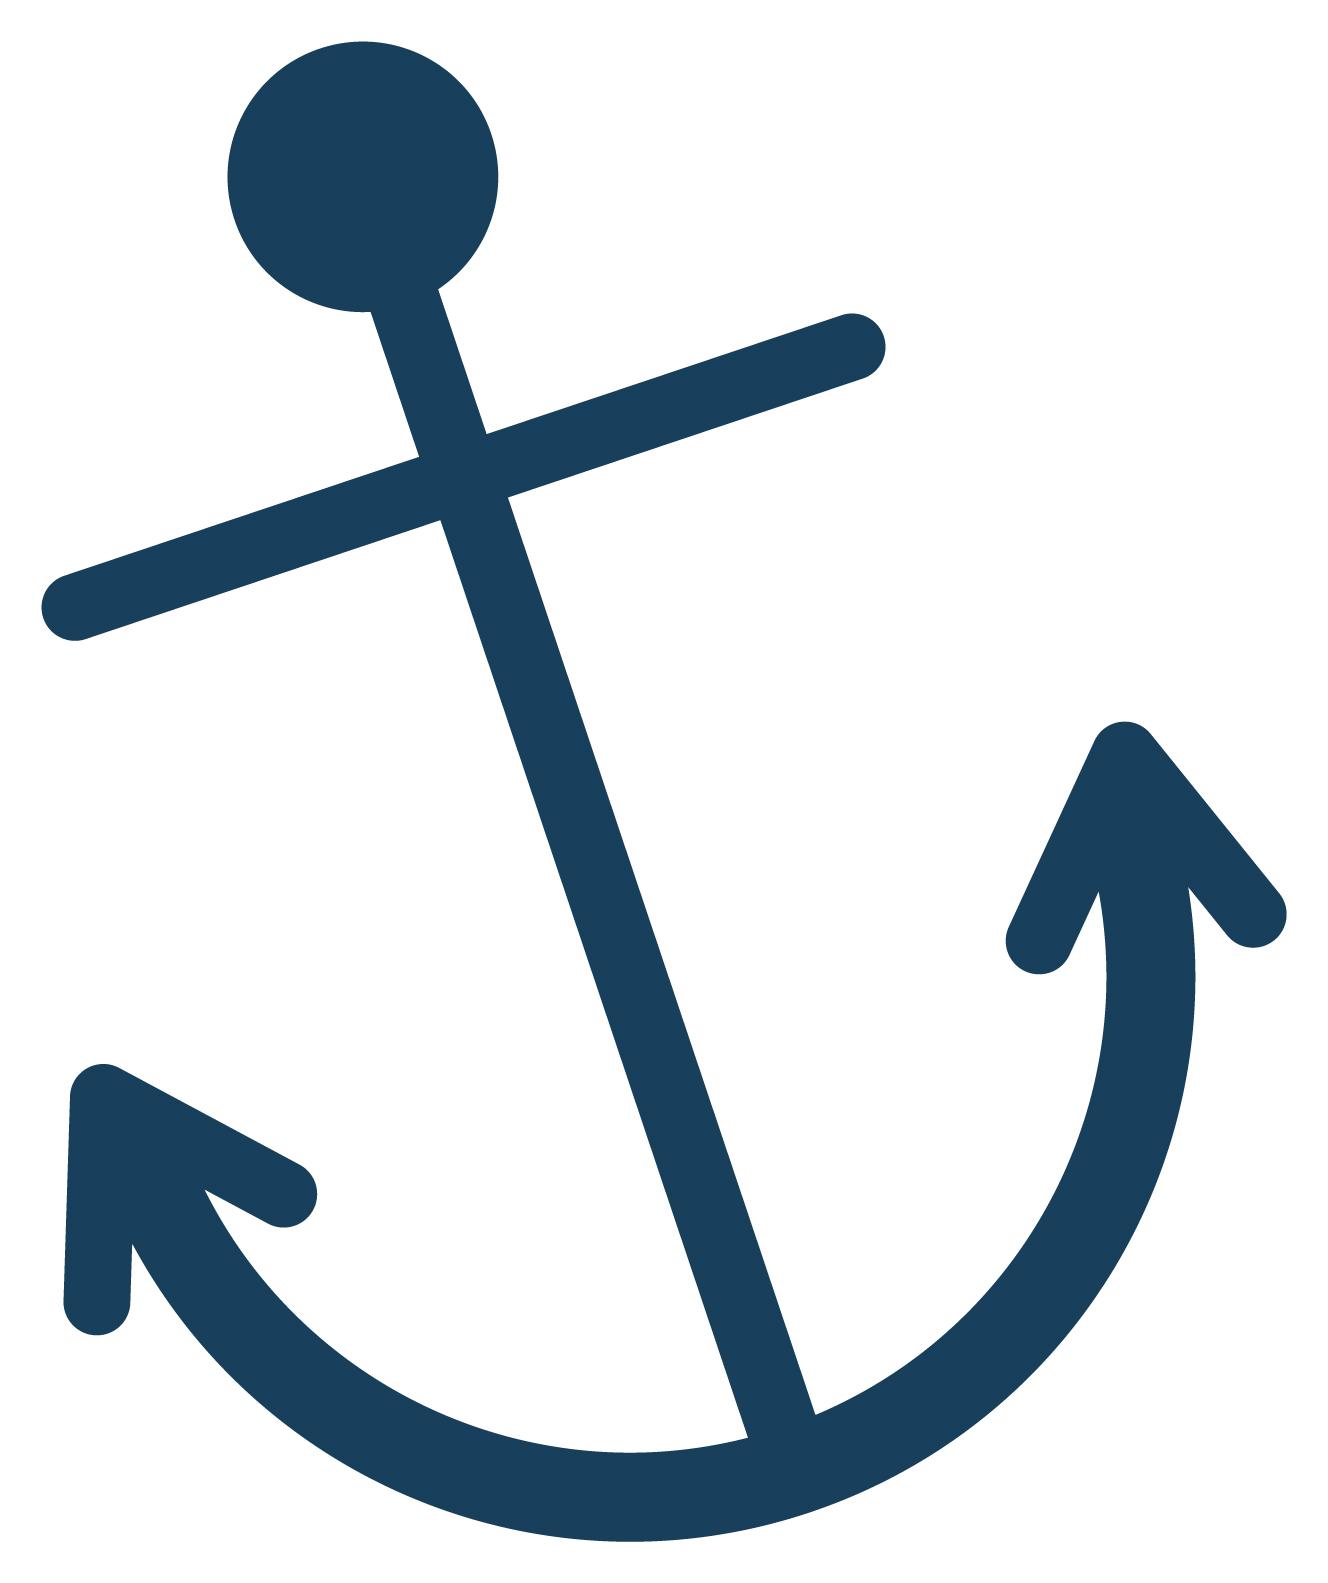 Clipart anchor logo image transparent Us Navy Anchor Clipart - Clipart Kid image transparent